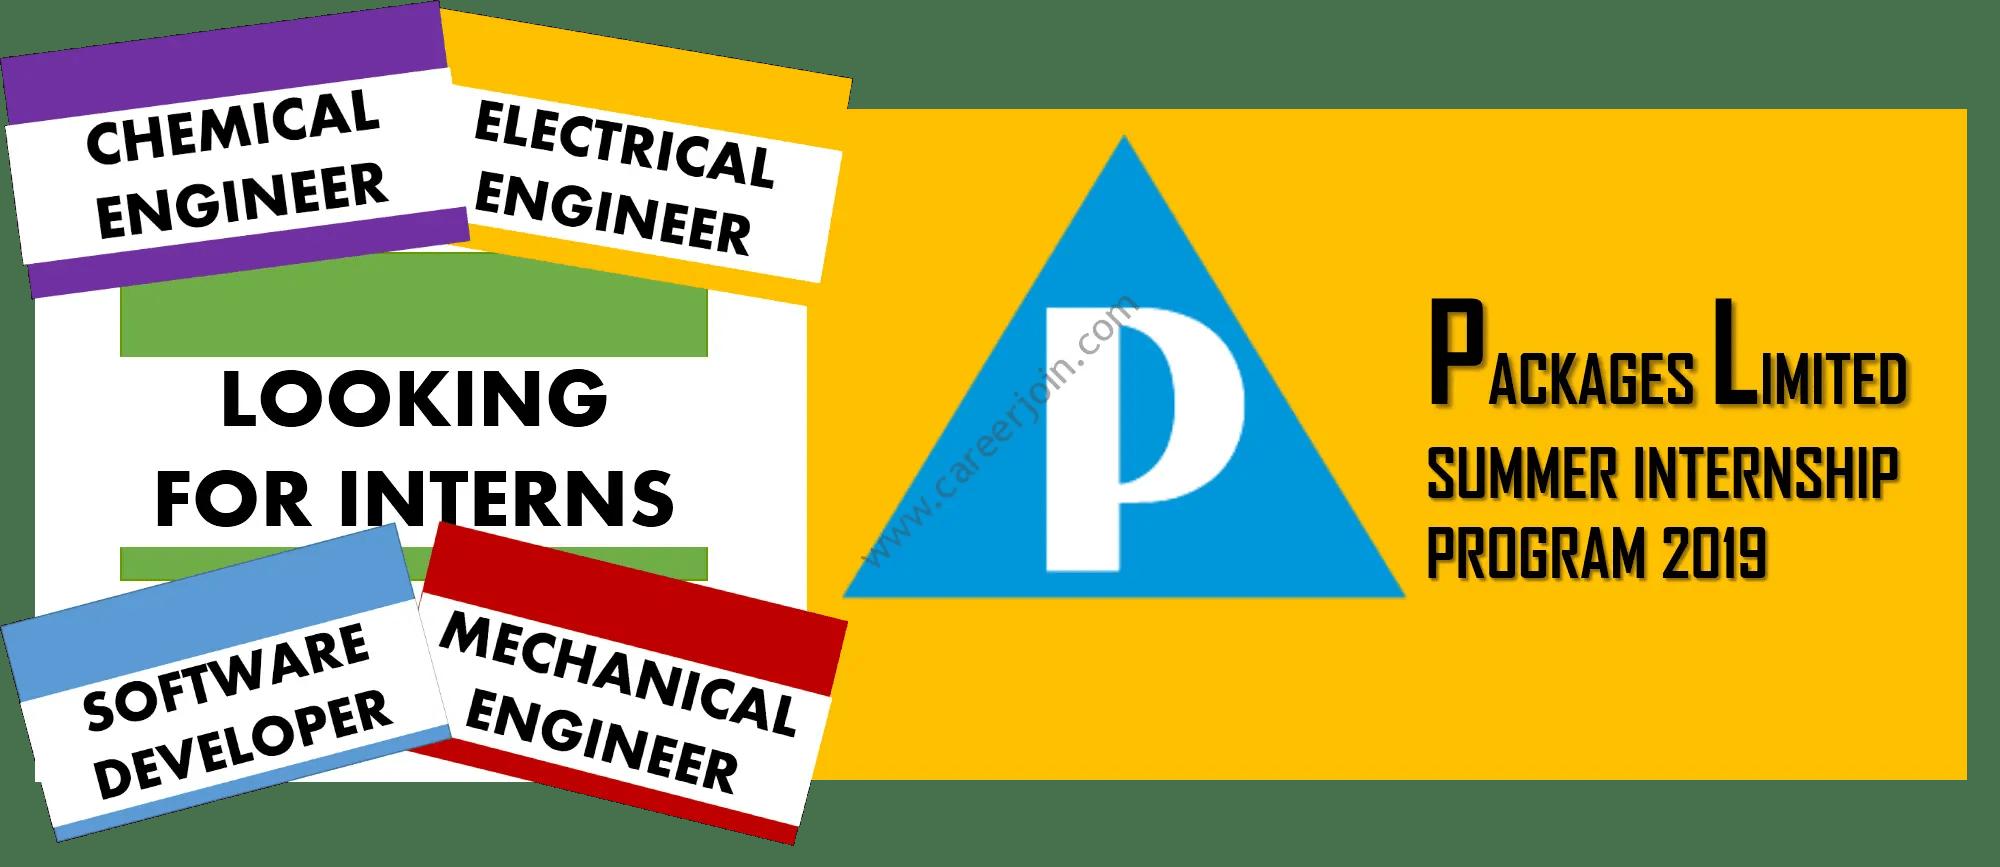 Packages Limited Summer Internship Program 2019